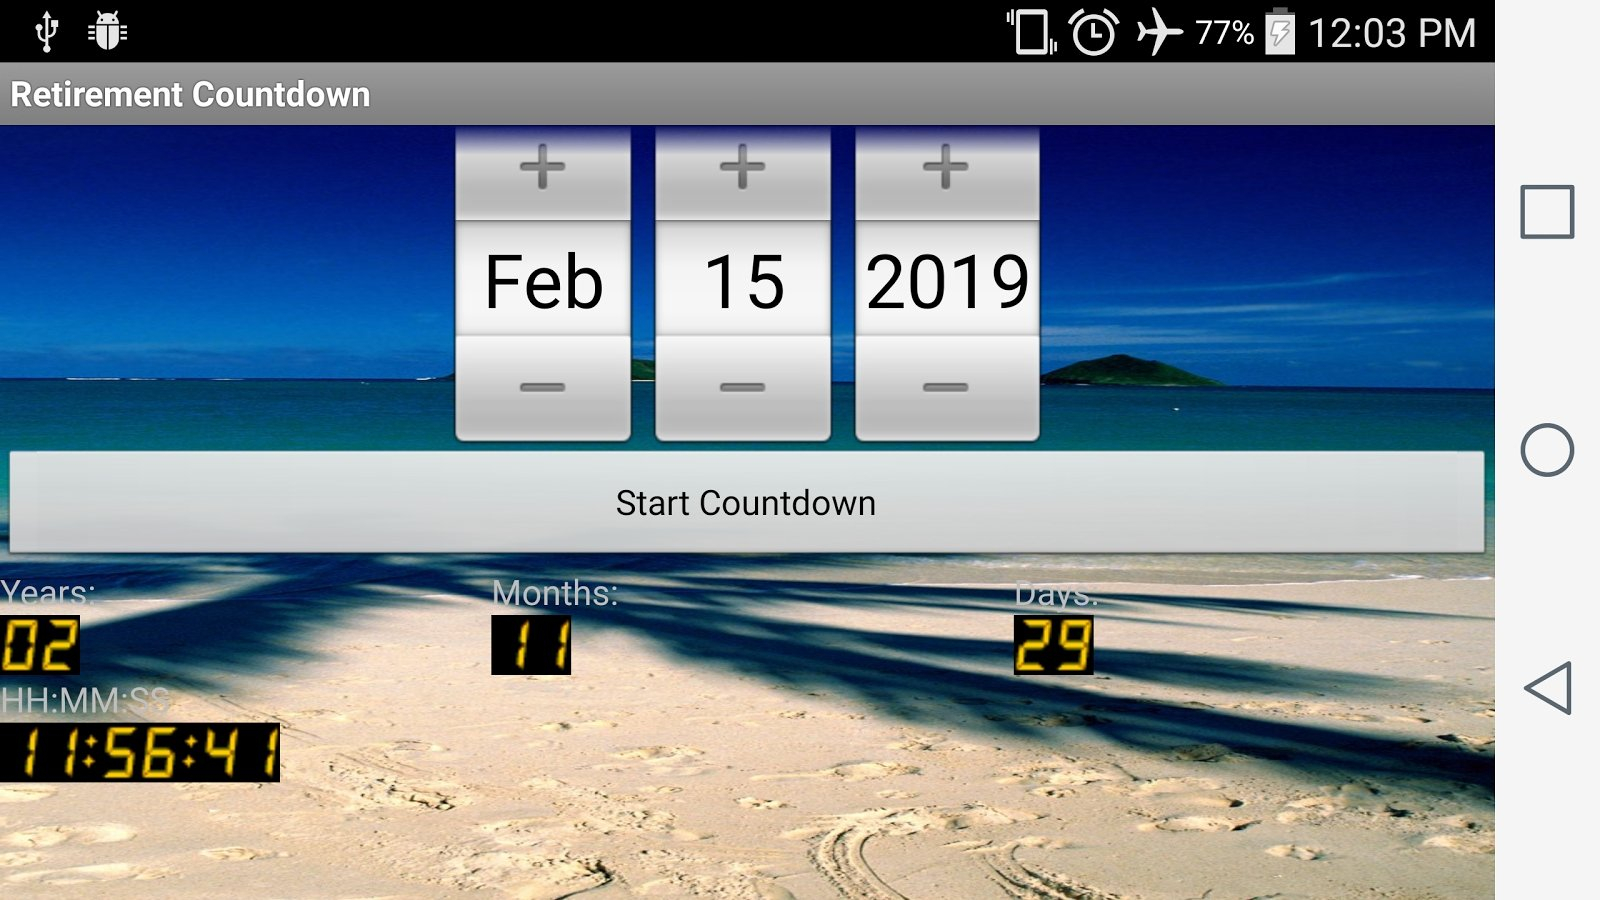 Short Timers Calendar Countdown Retirement :-Free Calendar Military Short Timer Calendar